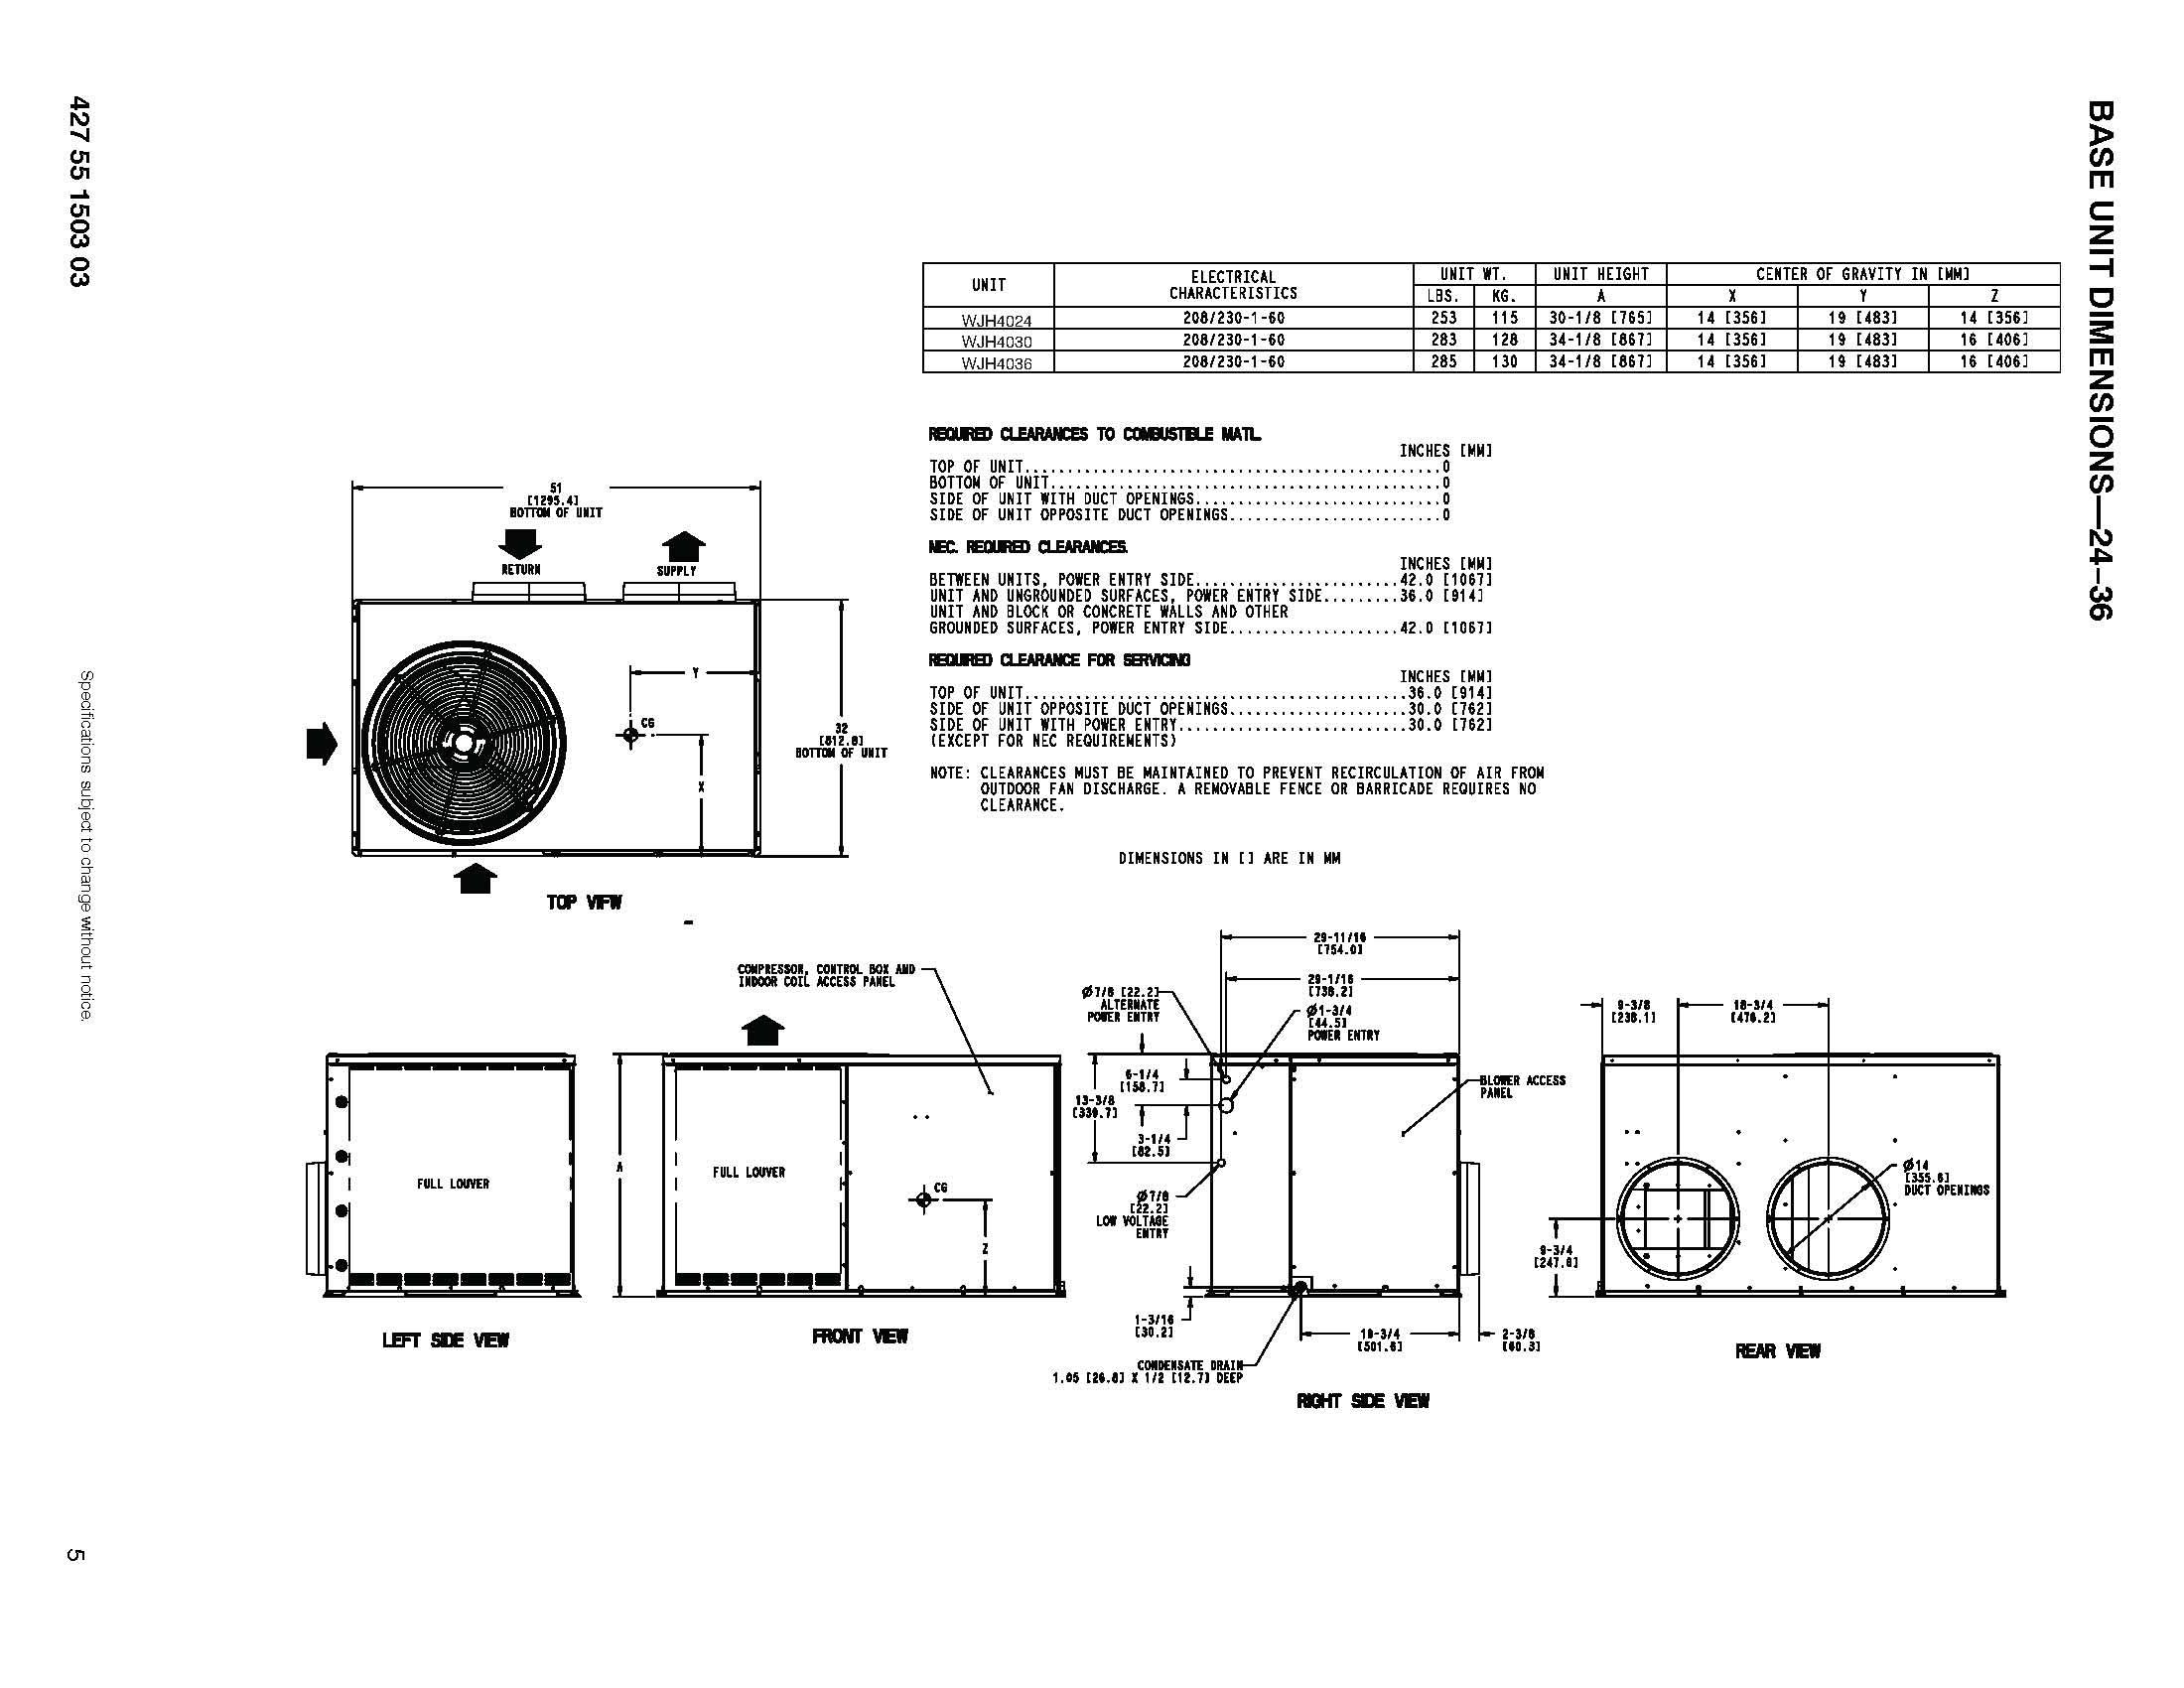 voltas package unit wiring diagram usb wire grandaire 2 ton 14 seer heat pump wjh424000ktp0a